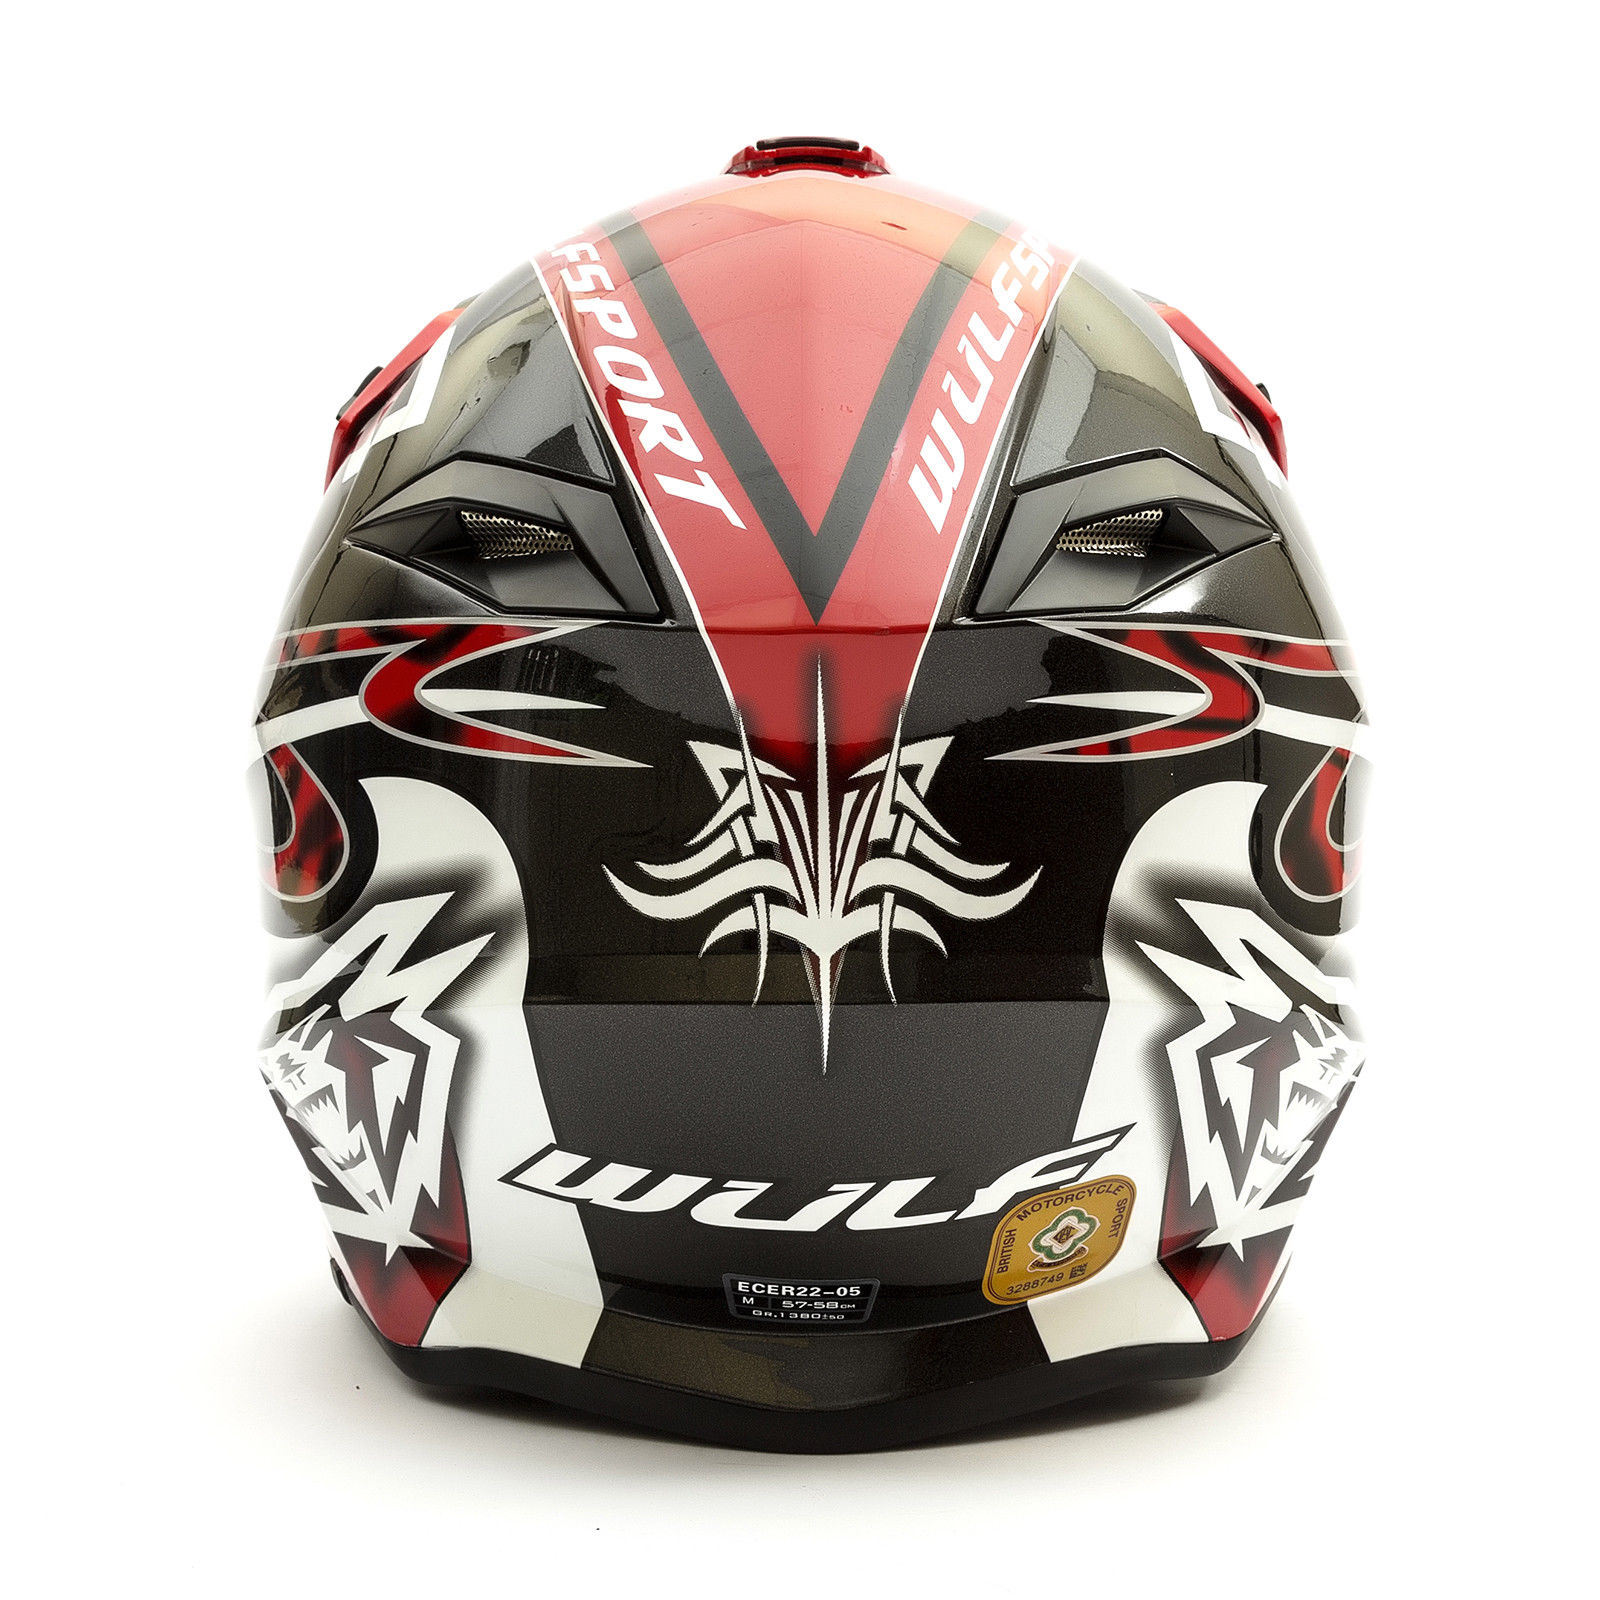 Wulfsport-Adult-Sceptre-Helmets-Motocross-Pitbike-Motorbike-Off-Road-Racing-ATV thumbnail 36